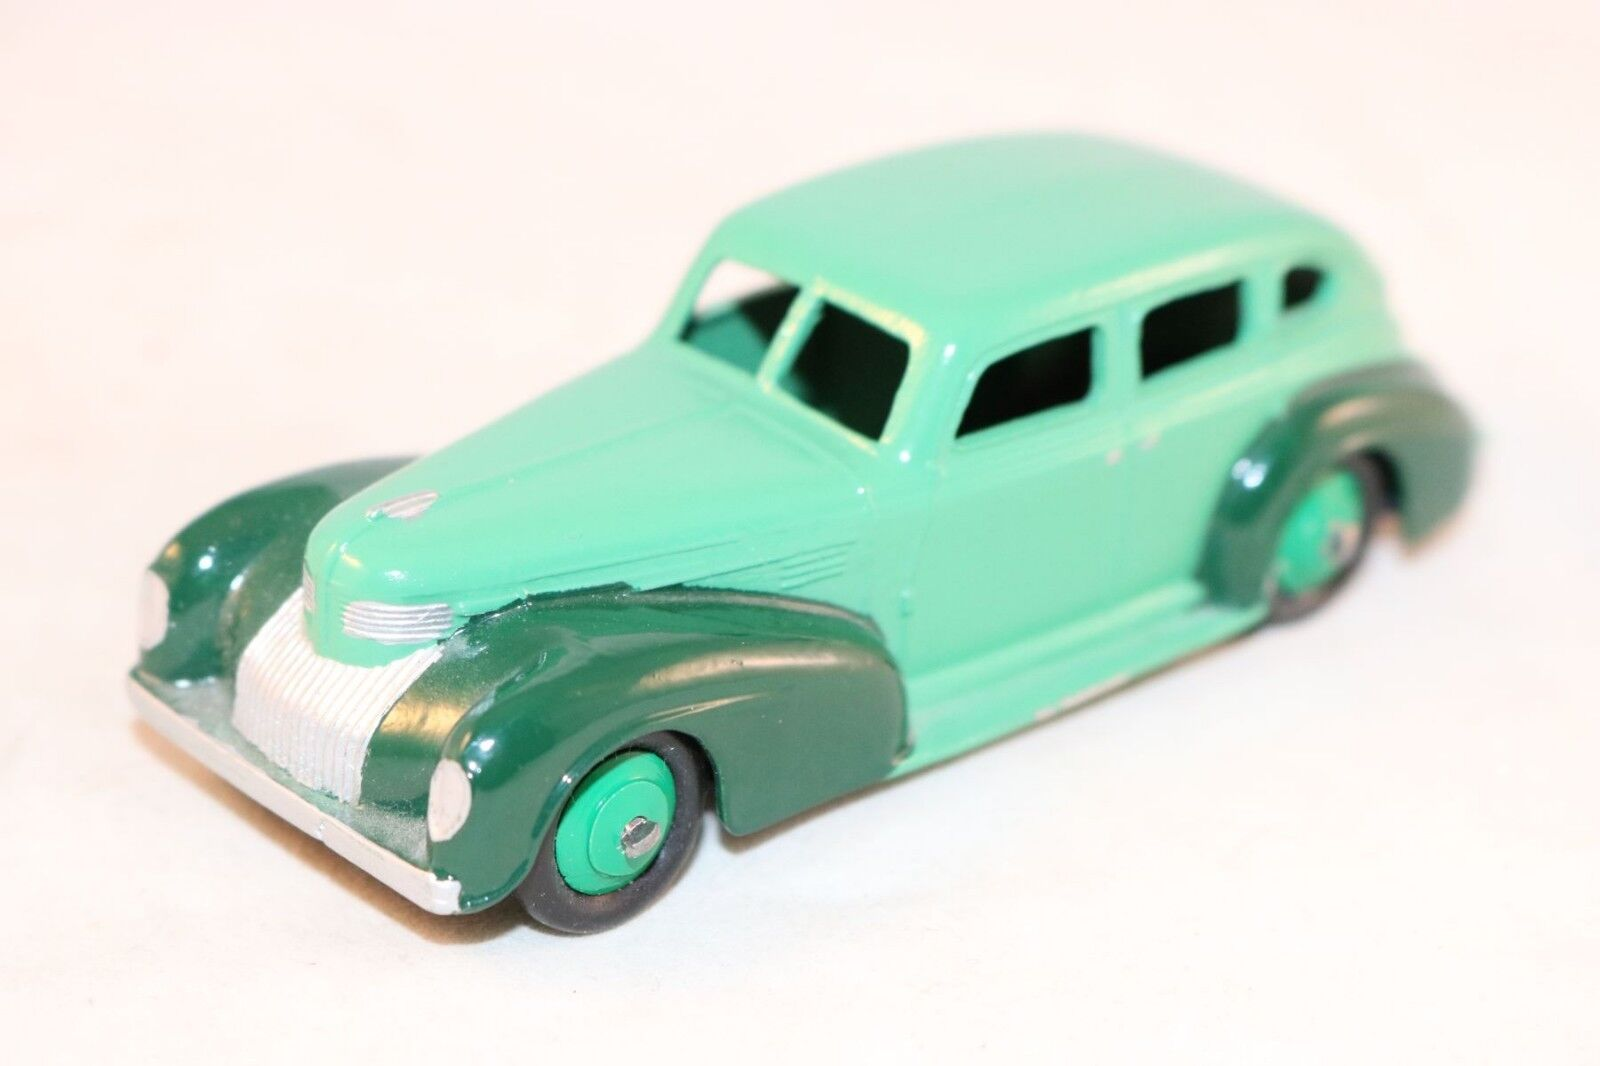 Schäbiges spielzeug 39 chrysler royal limousine vollkommen perfekt restauriert stufe grün